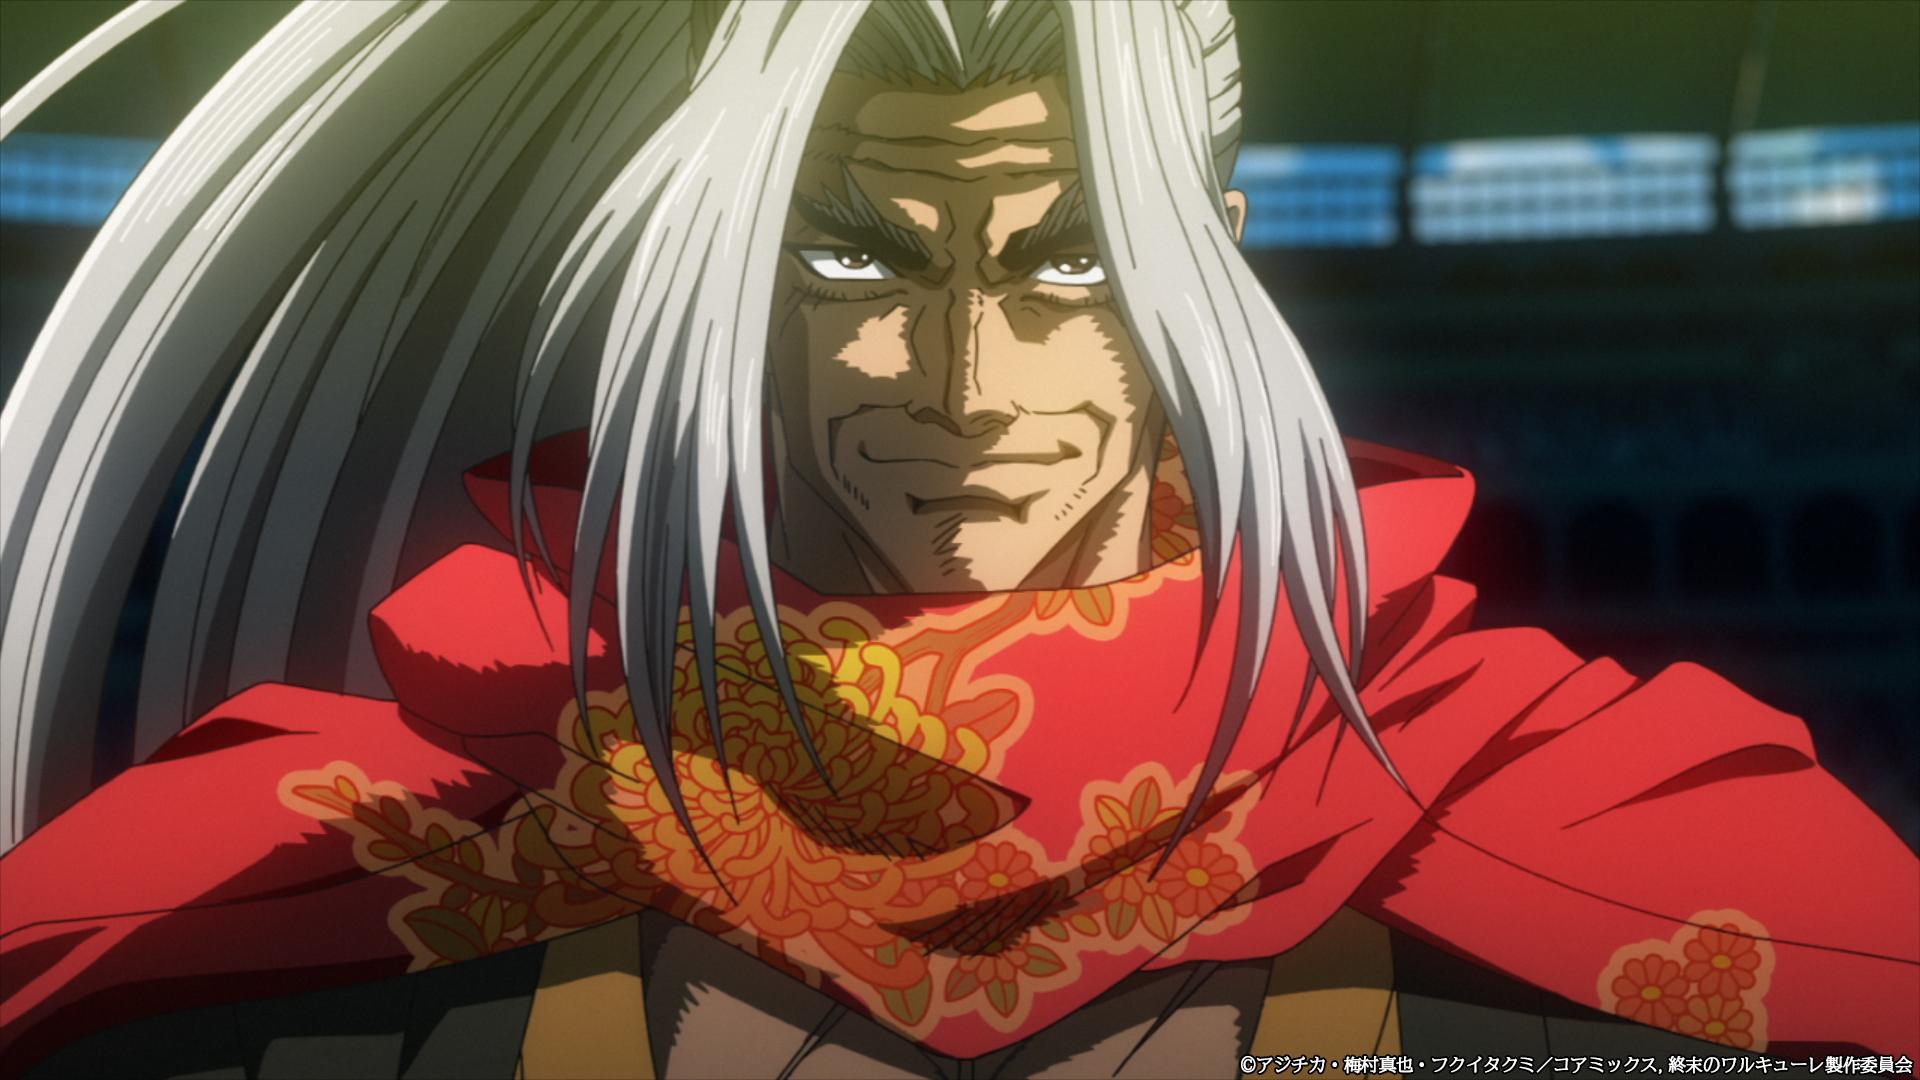 (C)アジチカ・梅村真也・フクイタクミ/コアミックス , 終末のワルキューレ製作委員会